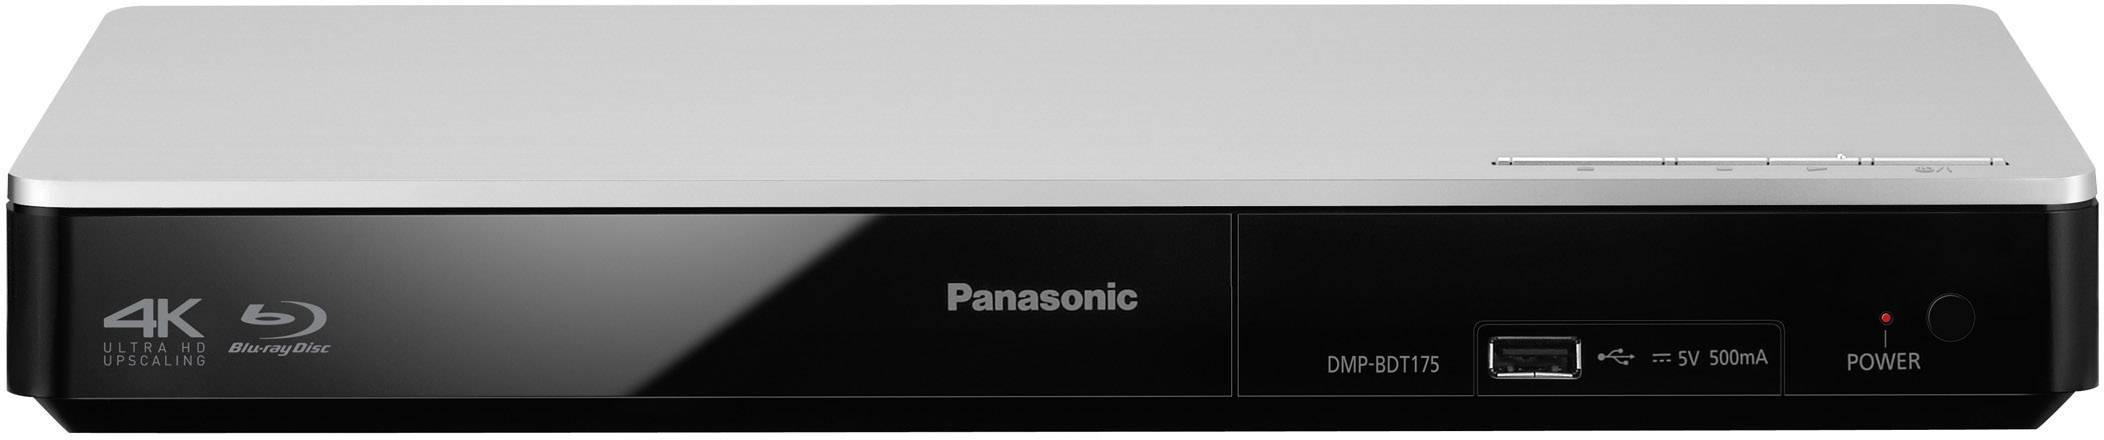 Panasonic DMP-BDT175EG Blu-ray Player Download Driver